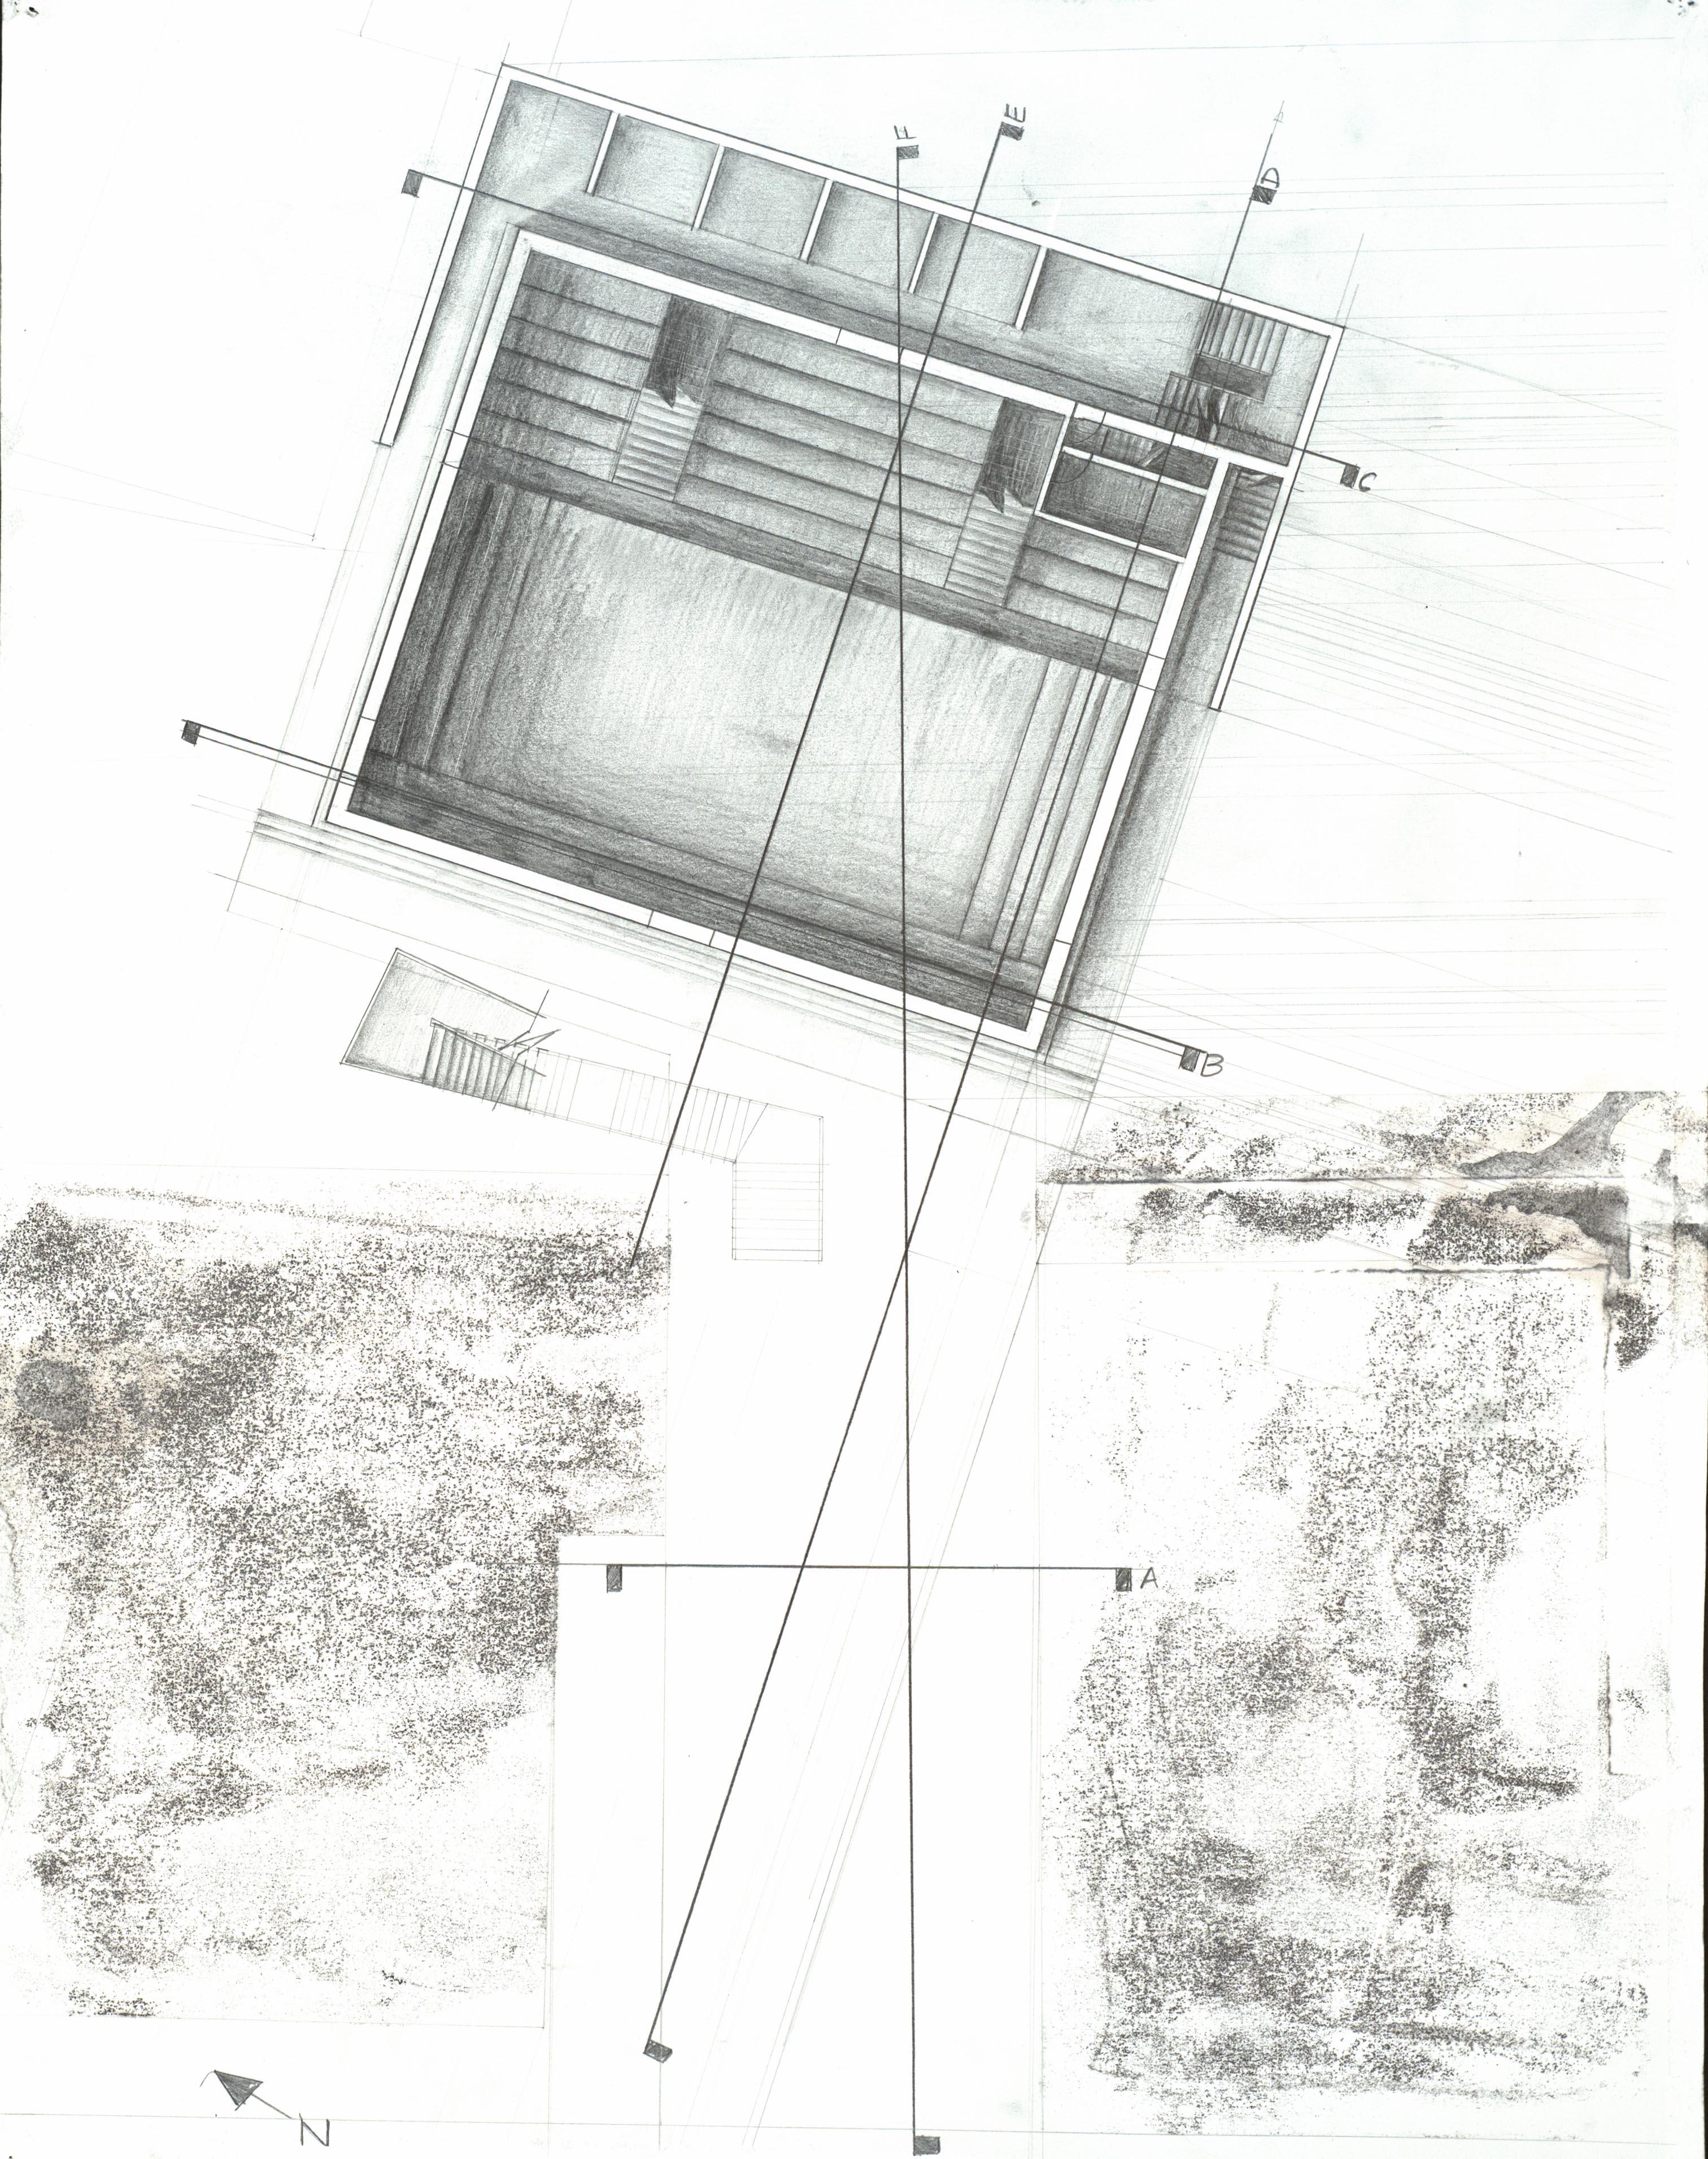 Black Box Theater By Alyssa Saltzgaber At Coroflot